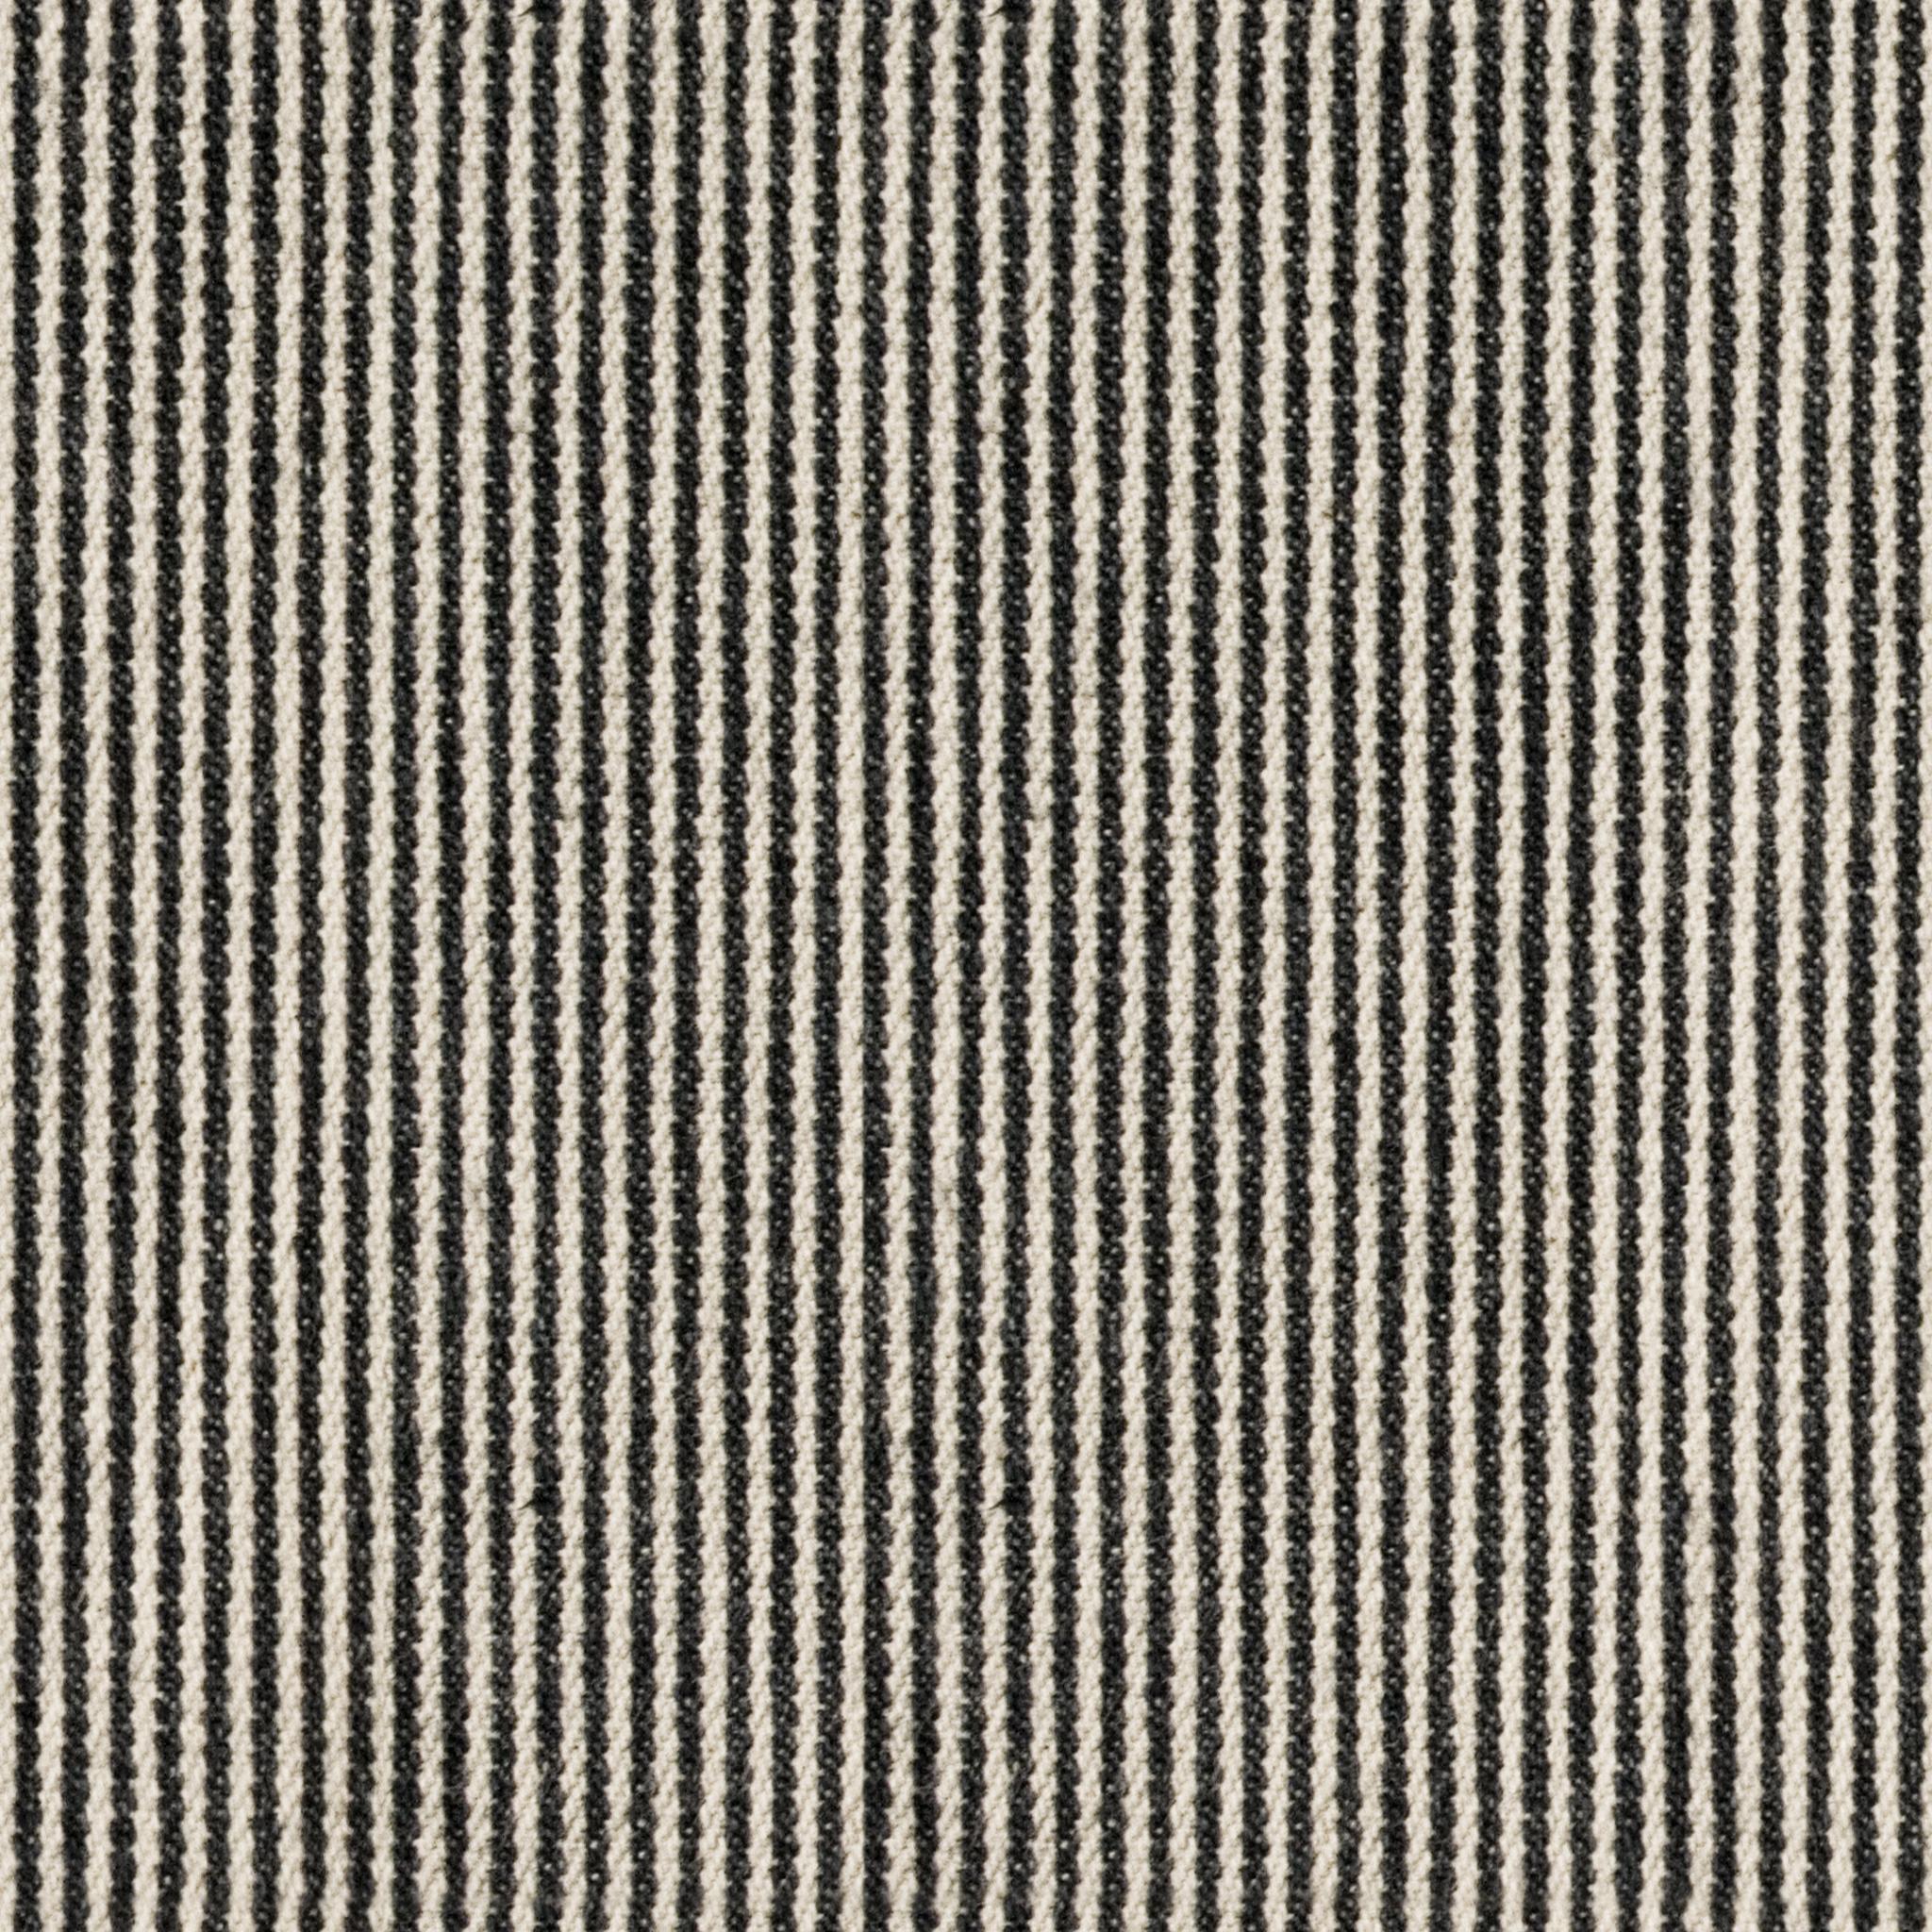 Black White Pinstripe.jpg